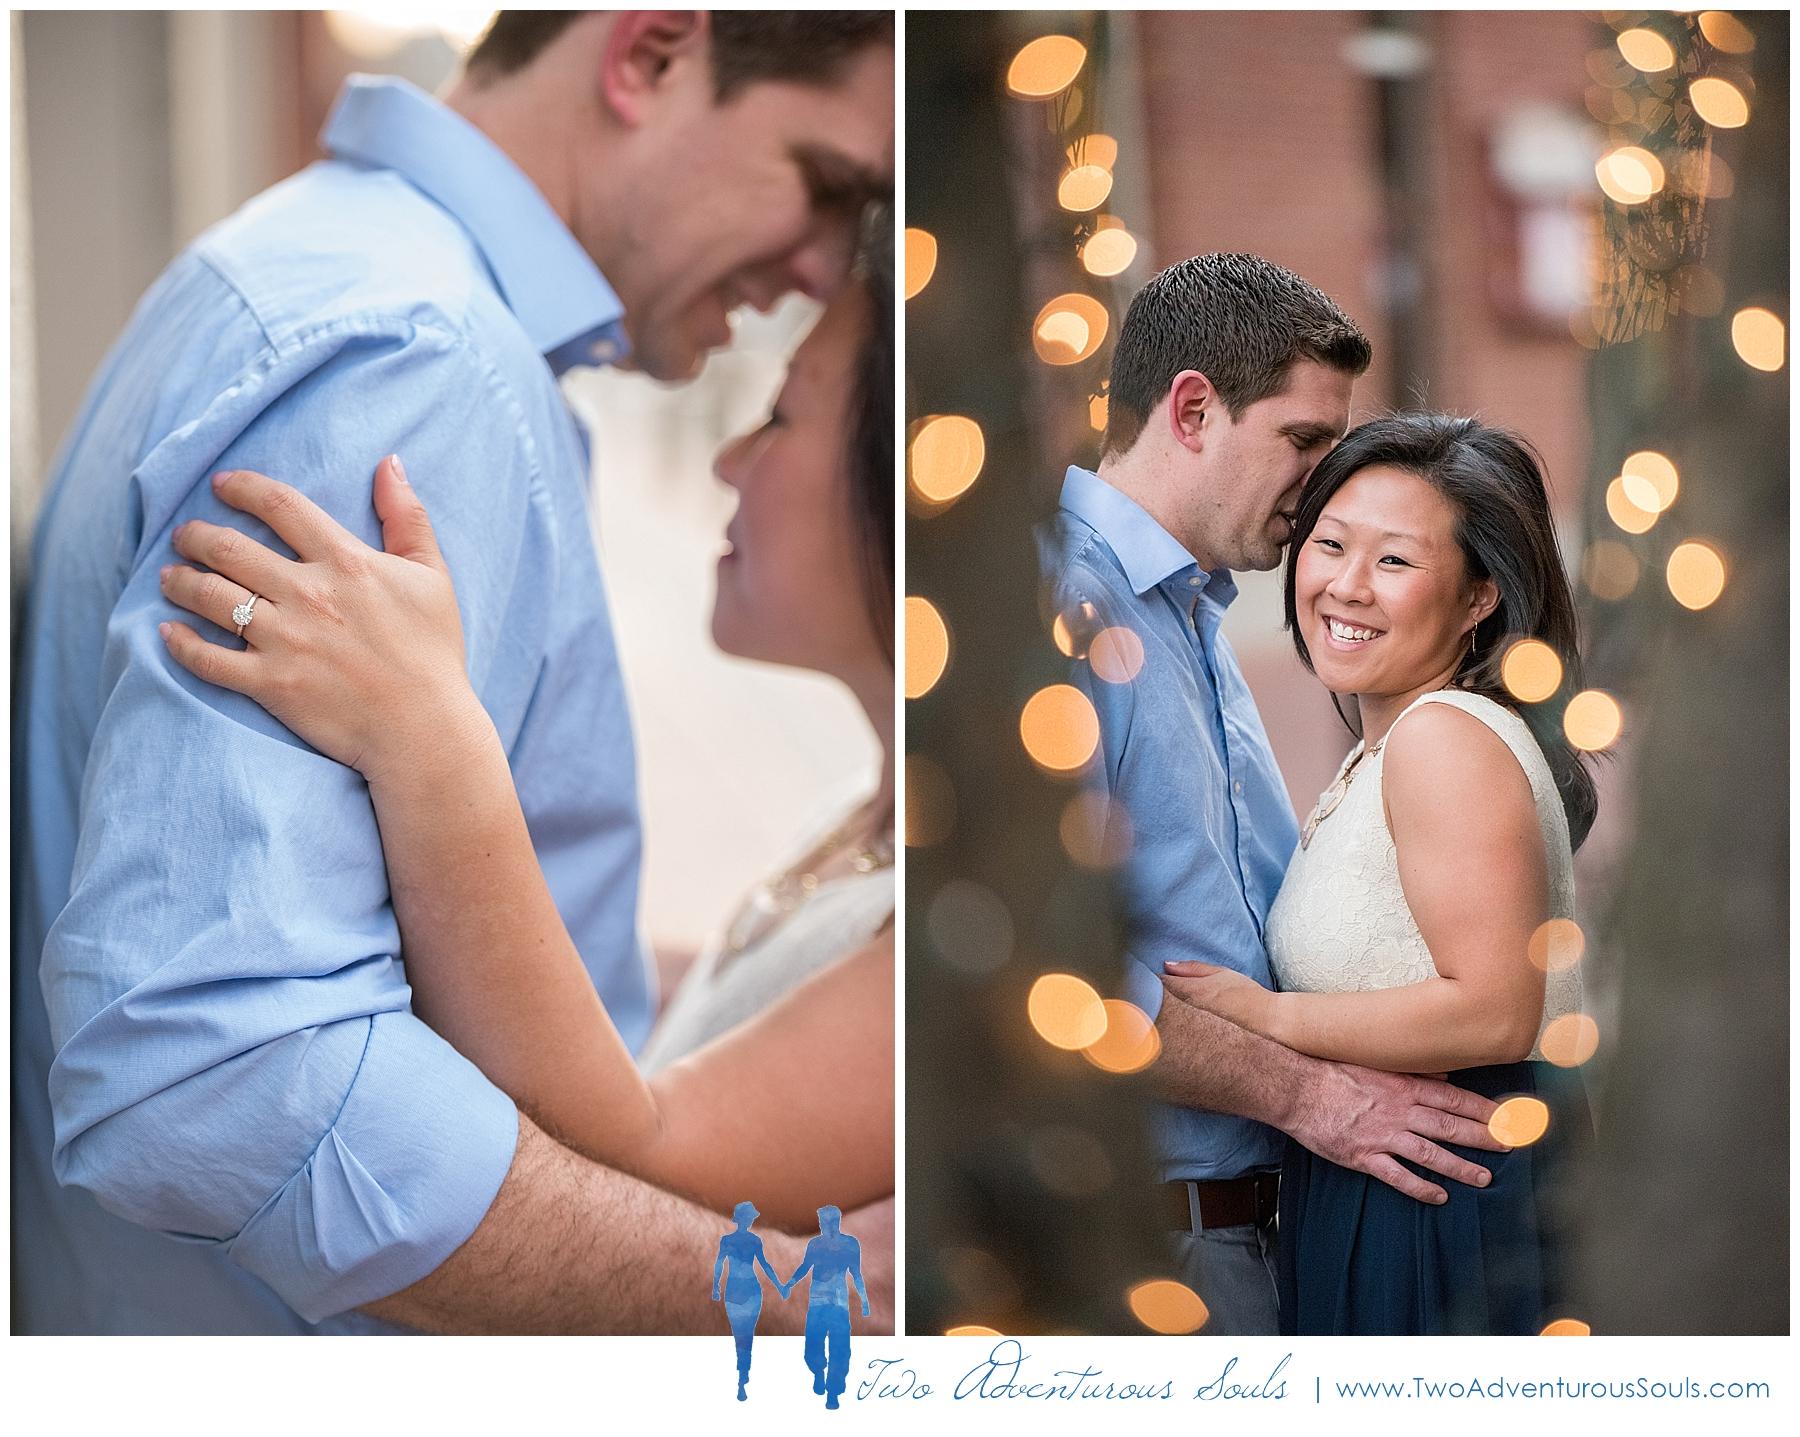 Salem MA Engagement Photos, Salem Wedding Photographer - Two Adventurous Souls_0006